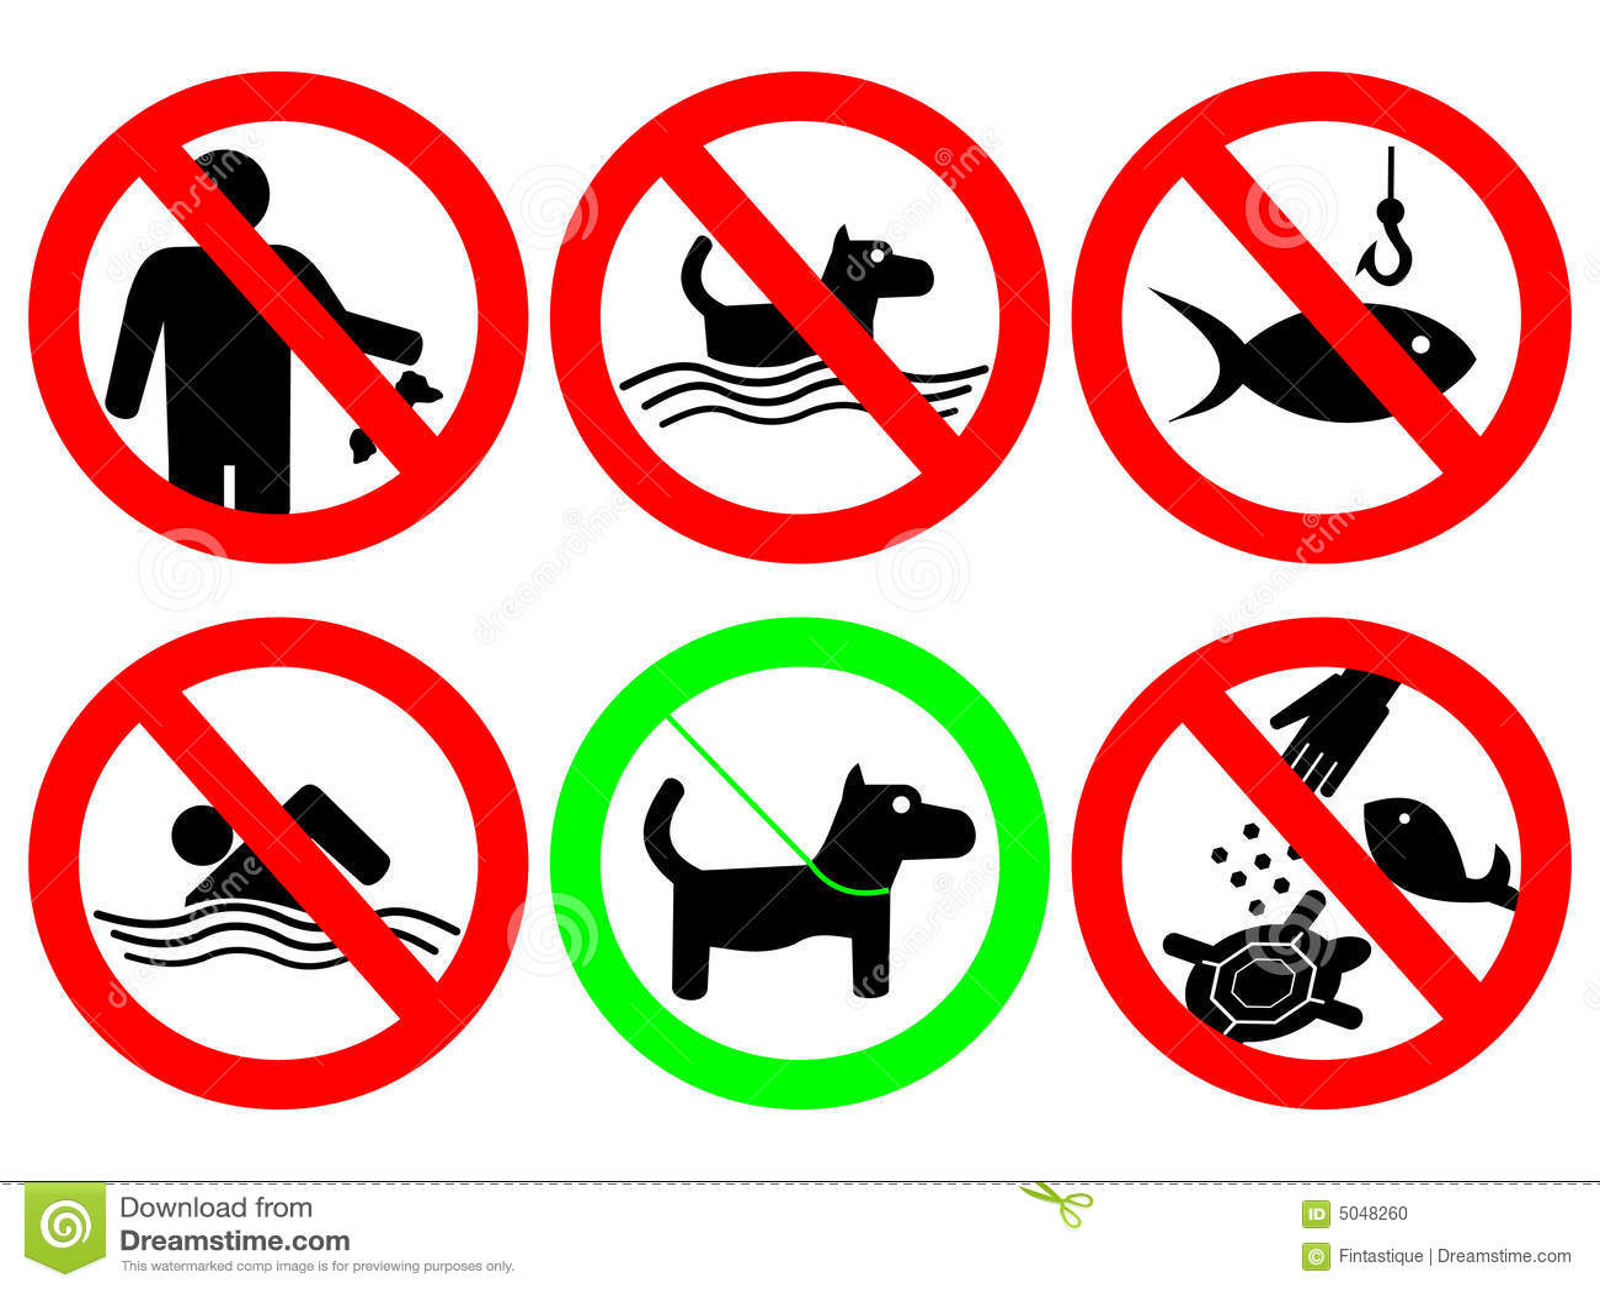 Garden gate plans - Park Rules Sign Stock Photo Image 5048260